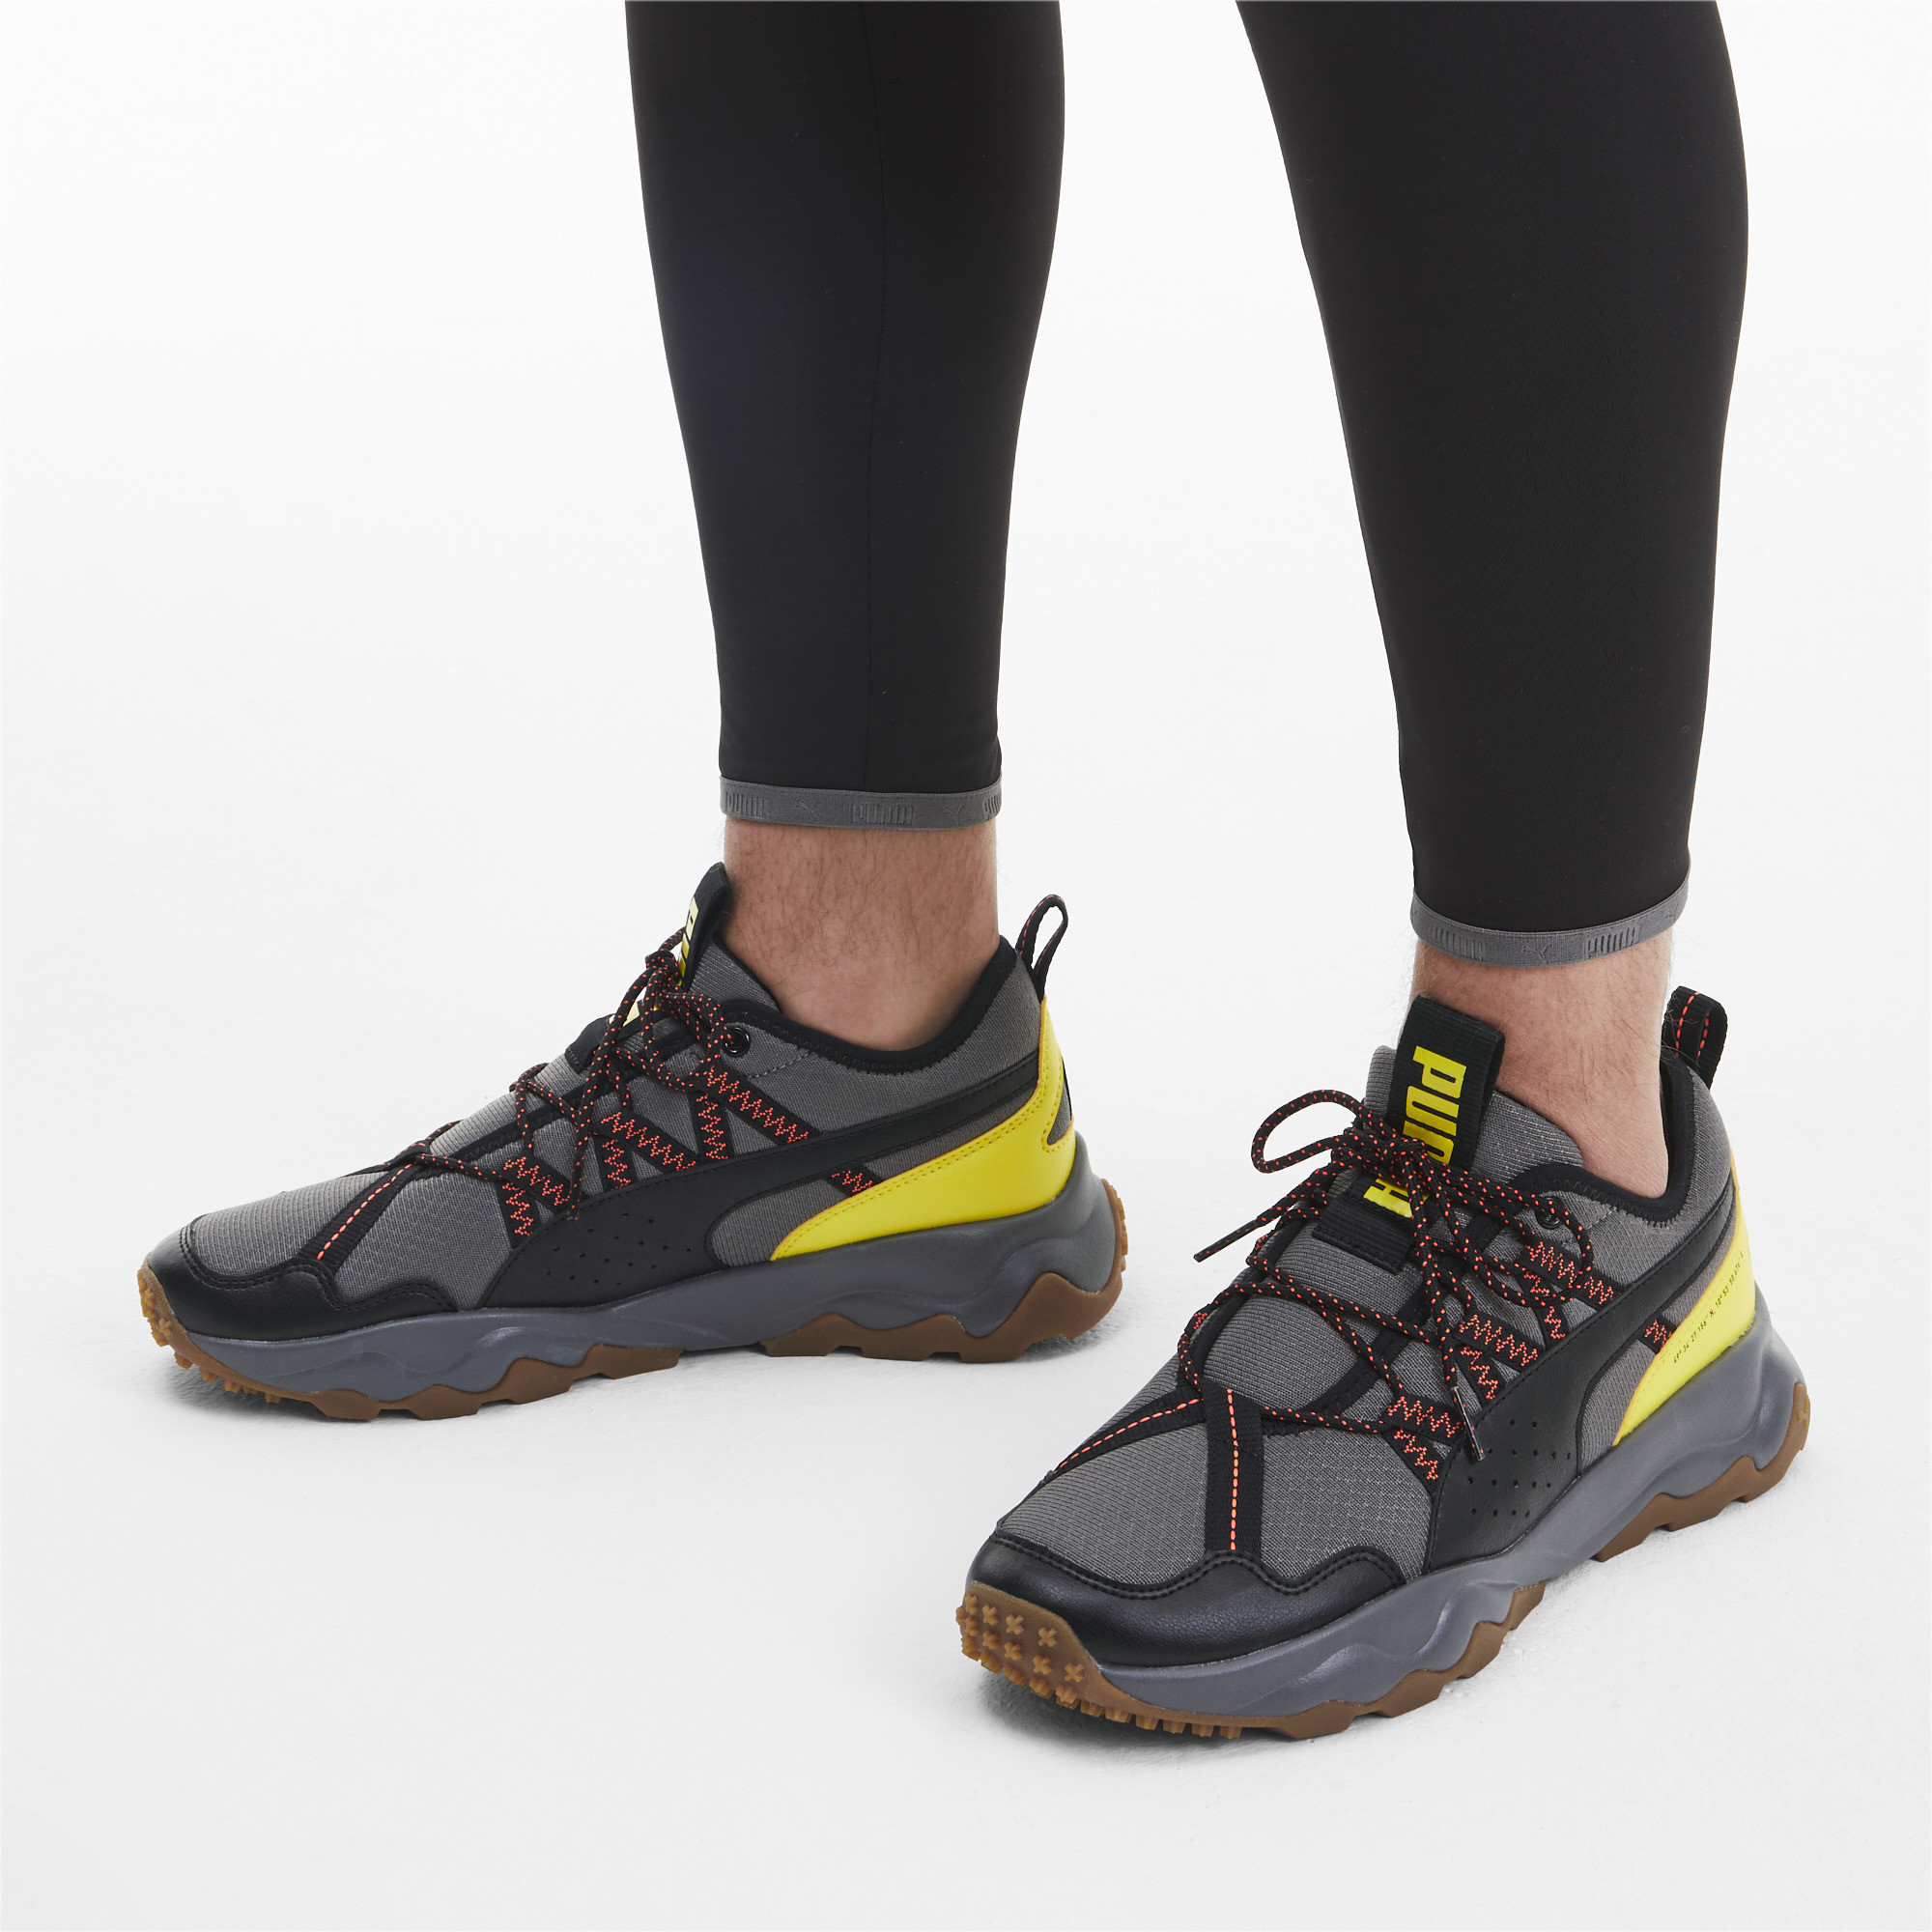 PUMA-Ember-Trail-Men-s-Running-Shoes-Men-Shoe-Running thumbnail 13